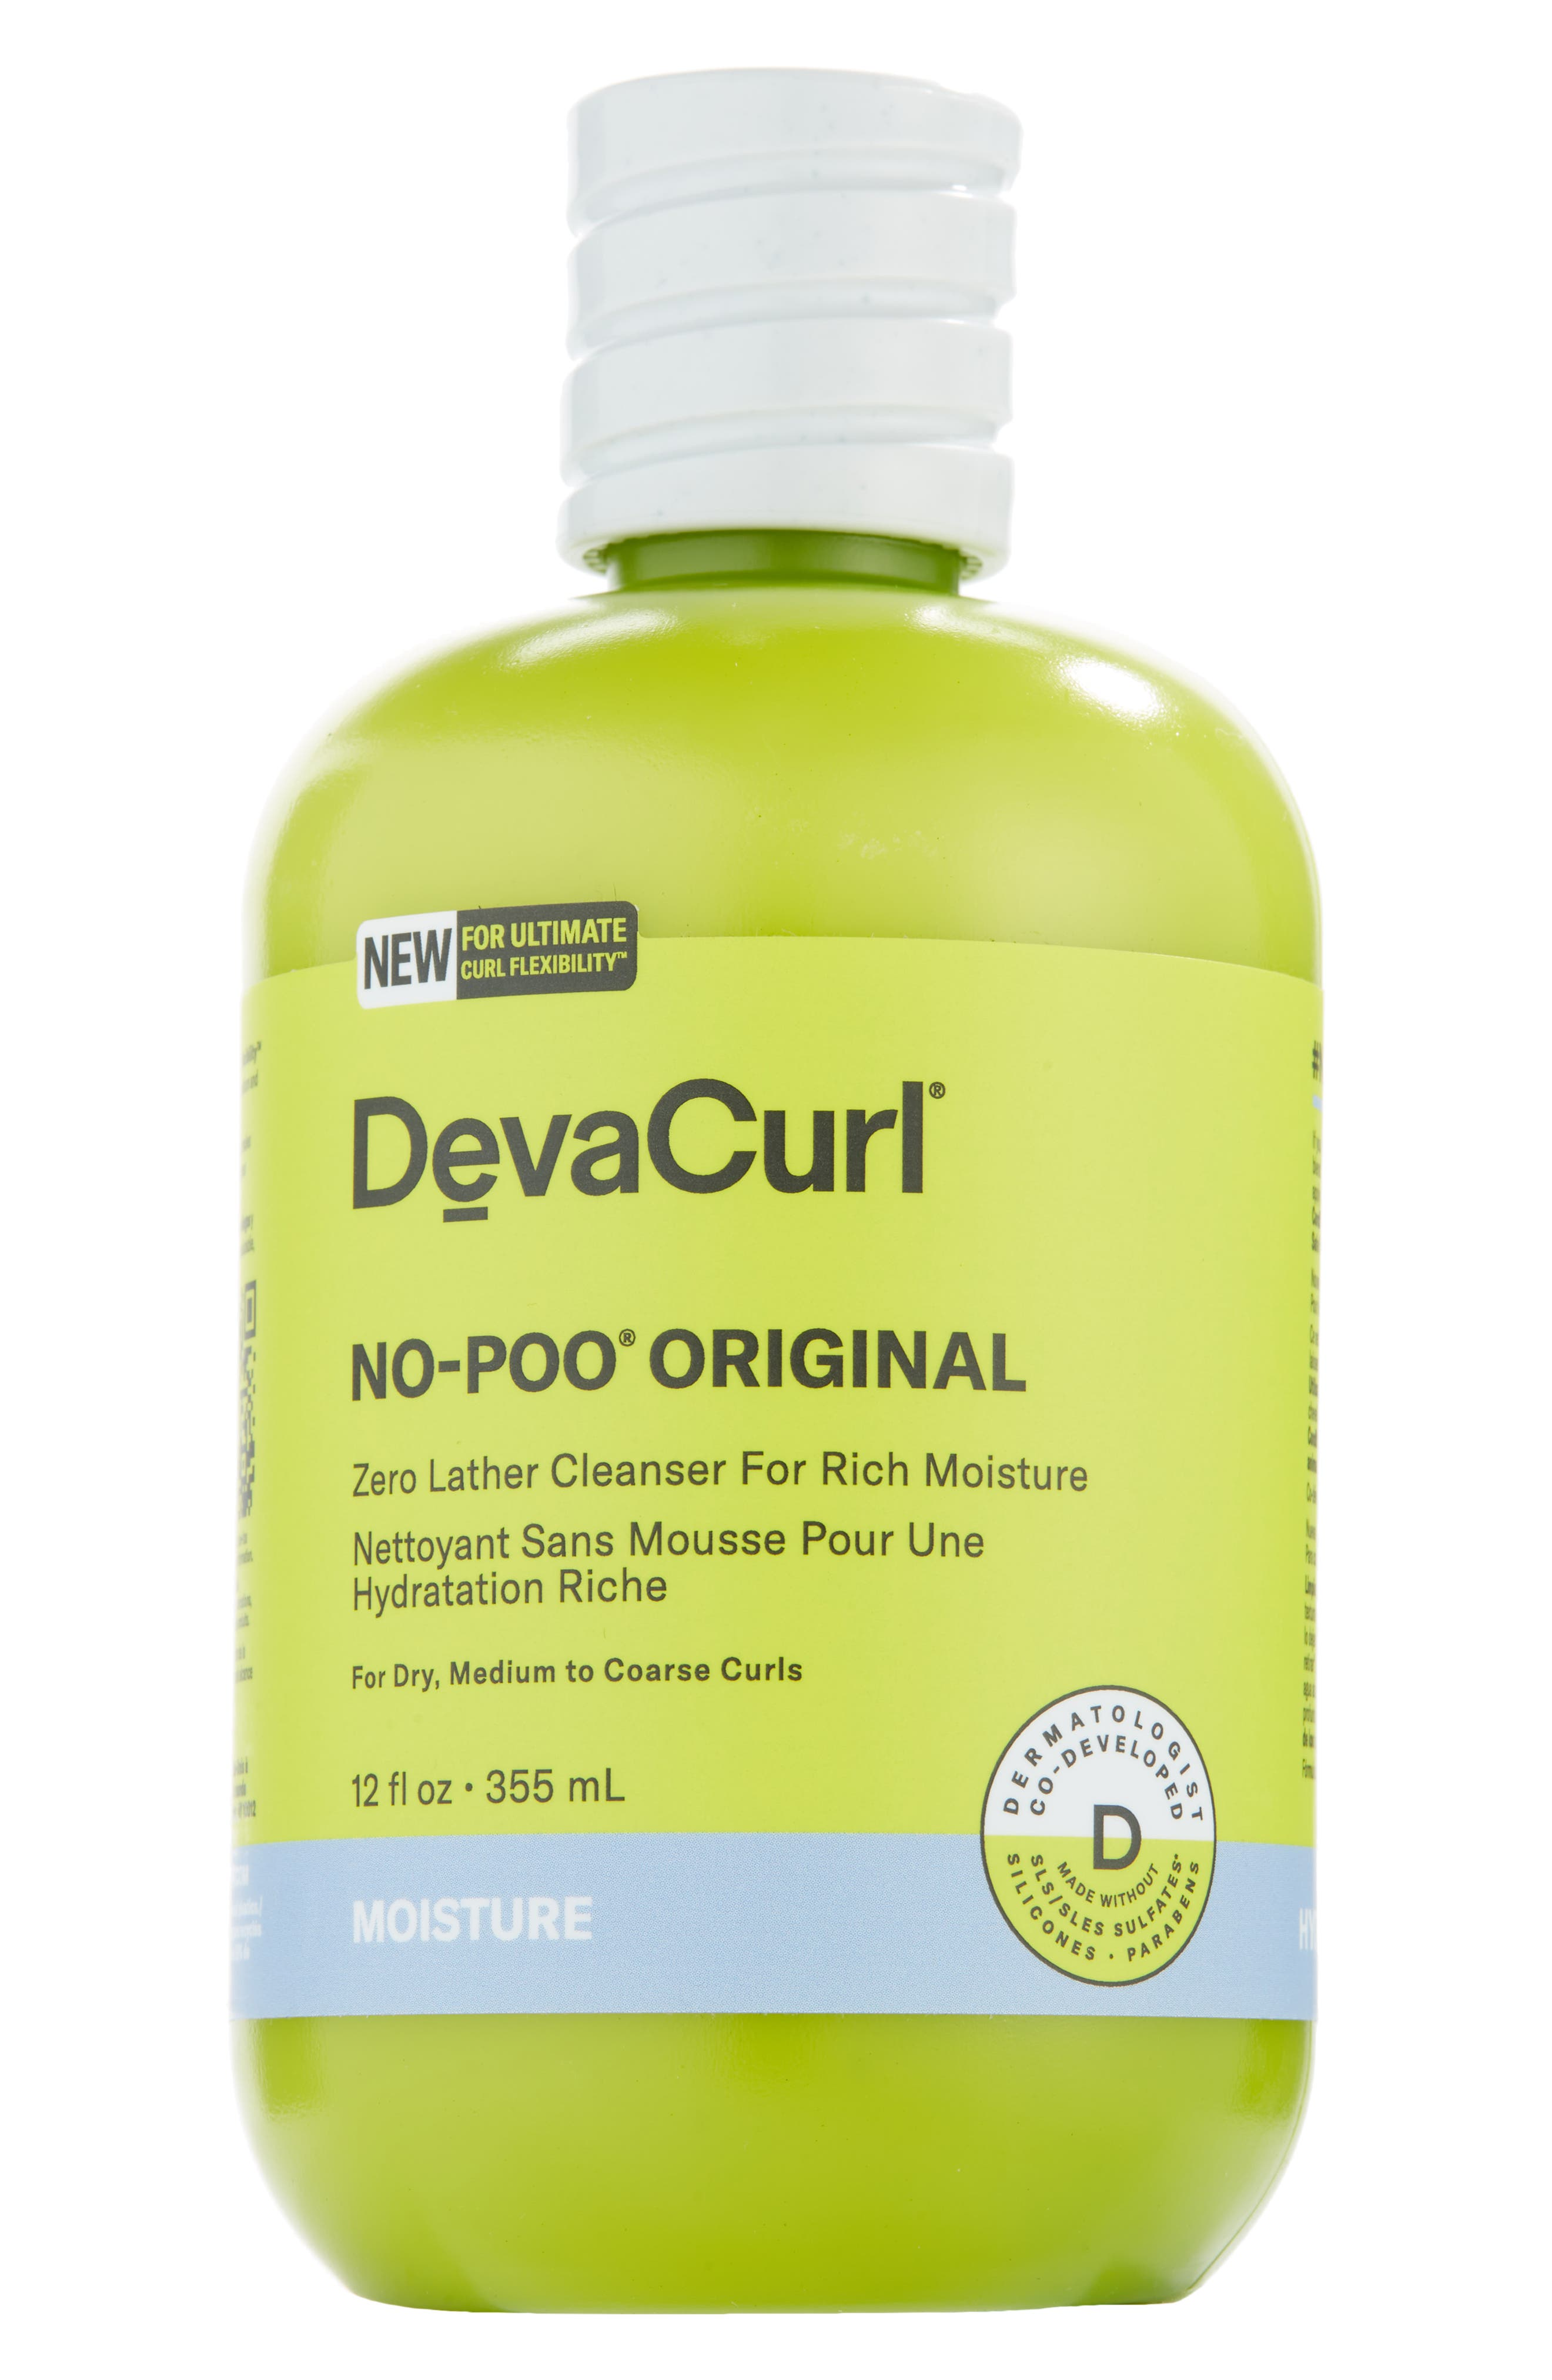 No-Poo Original Zero Lather Cleanser